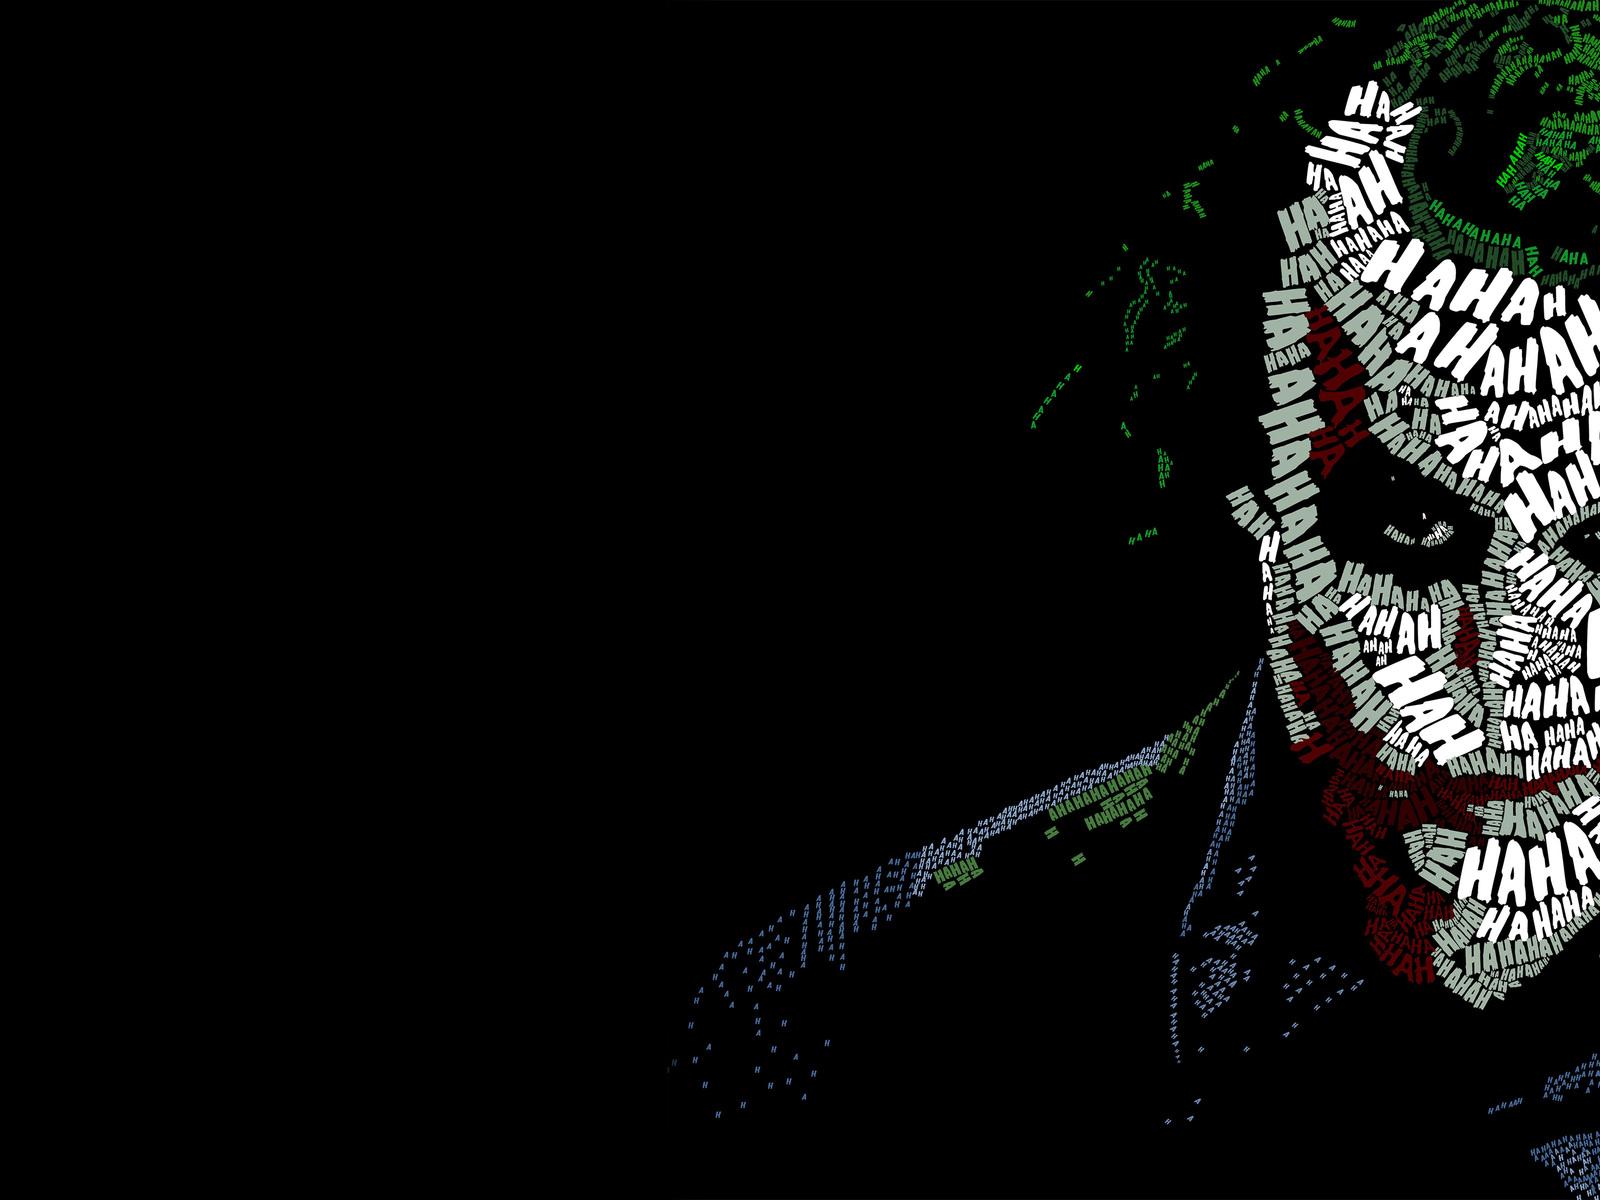 joker-typography-jb.jpg